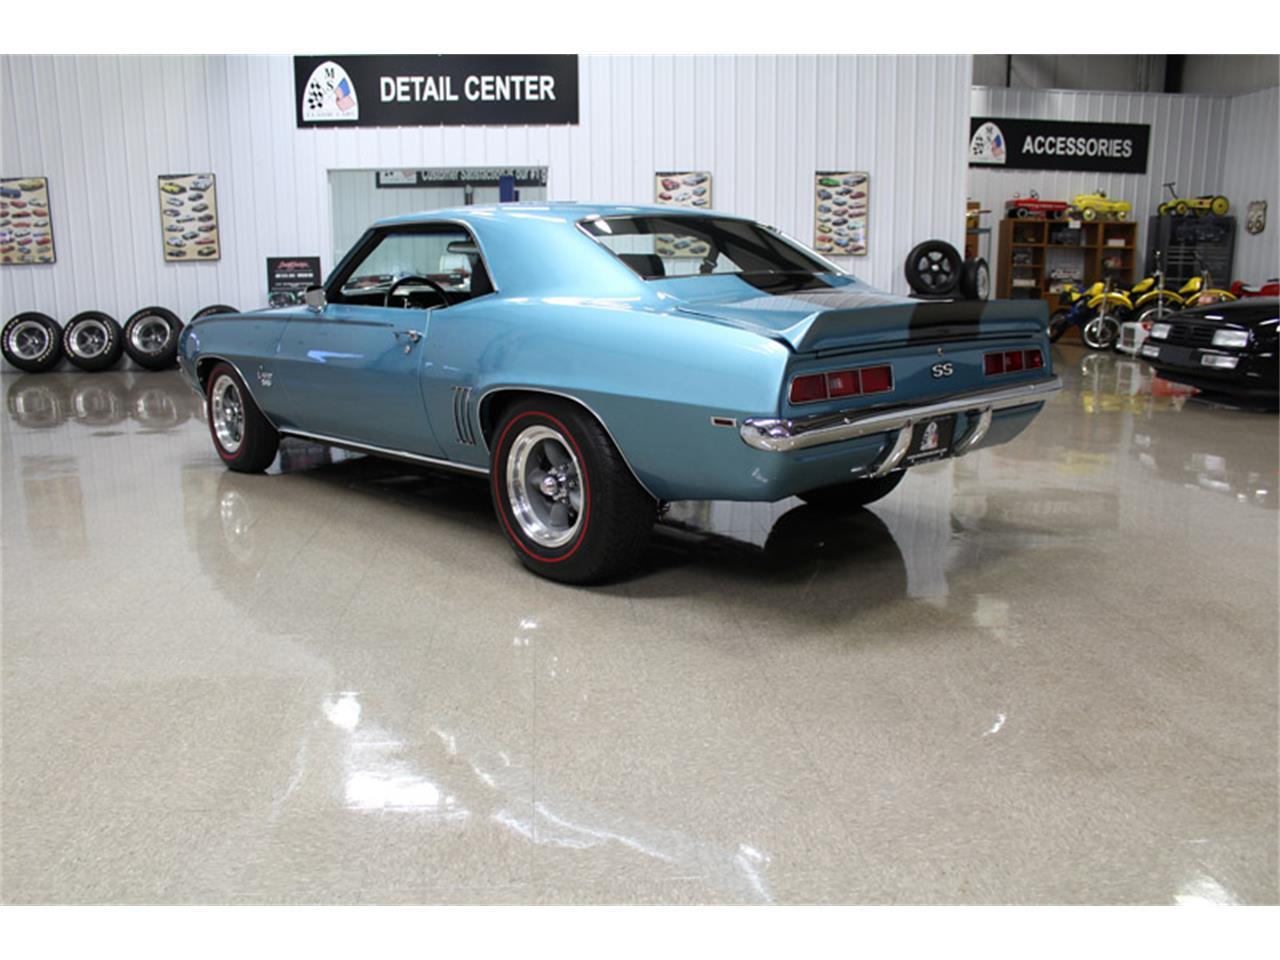 For Sale: 1969 Chevrolet Camaro in Seekonk, Massachusetts